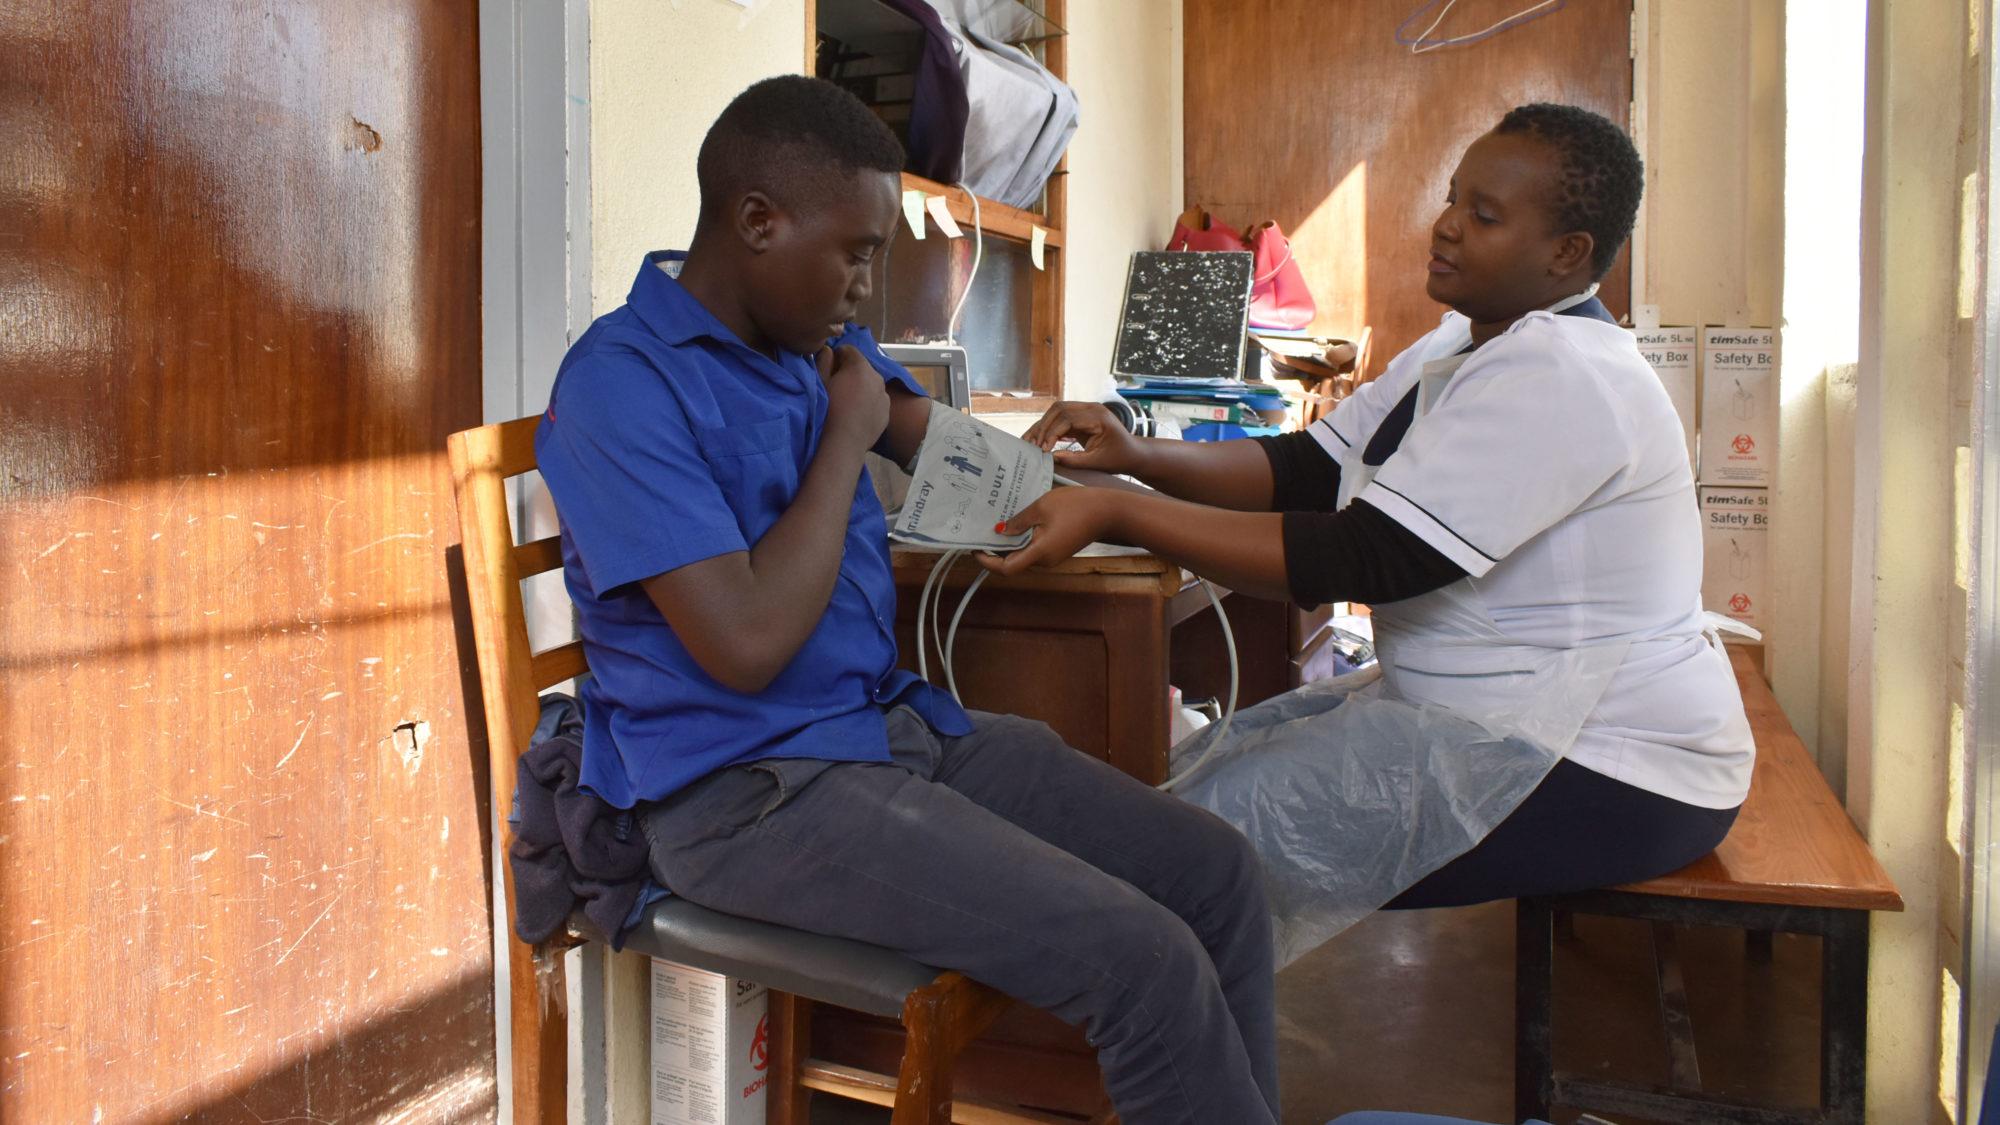 Asekanadziwa Mtangwanika, a nurse, takes a cancer patient's blood pressure at Kamuzu Central Hospital in Lilongwe, Malawi. (Photo courtesy of UNC Project Malawi)